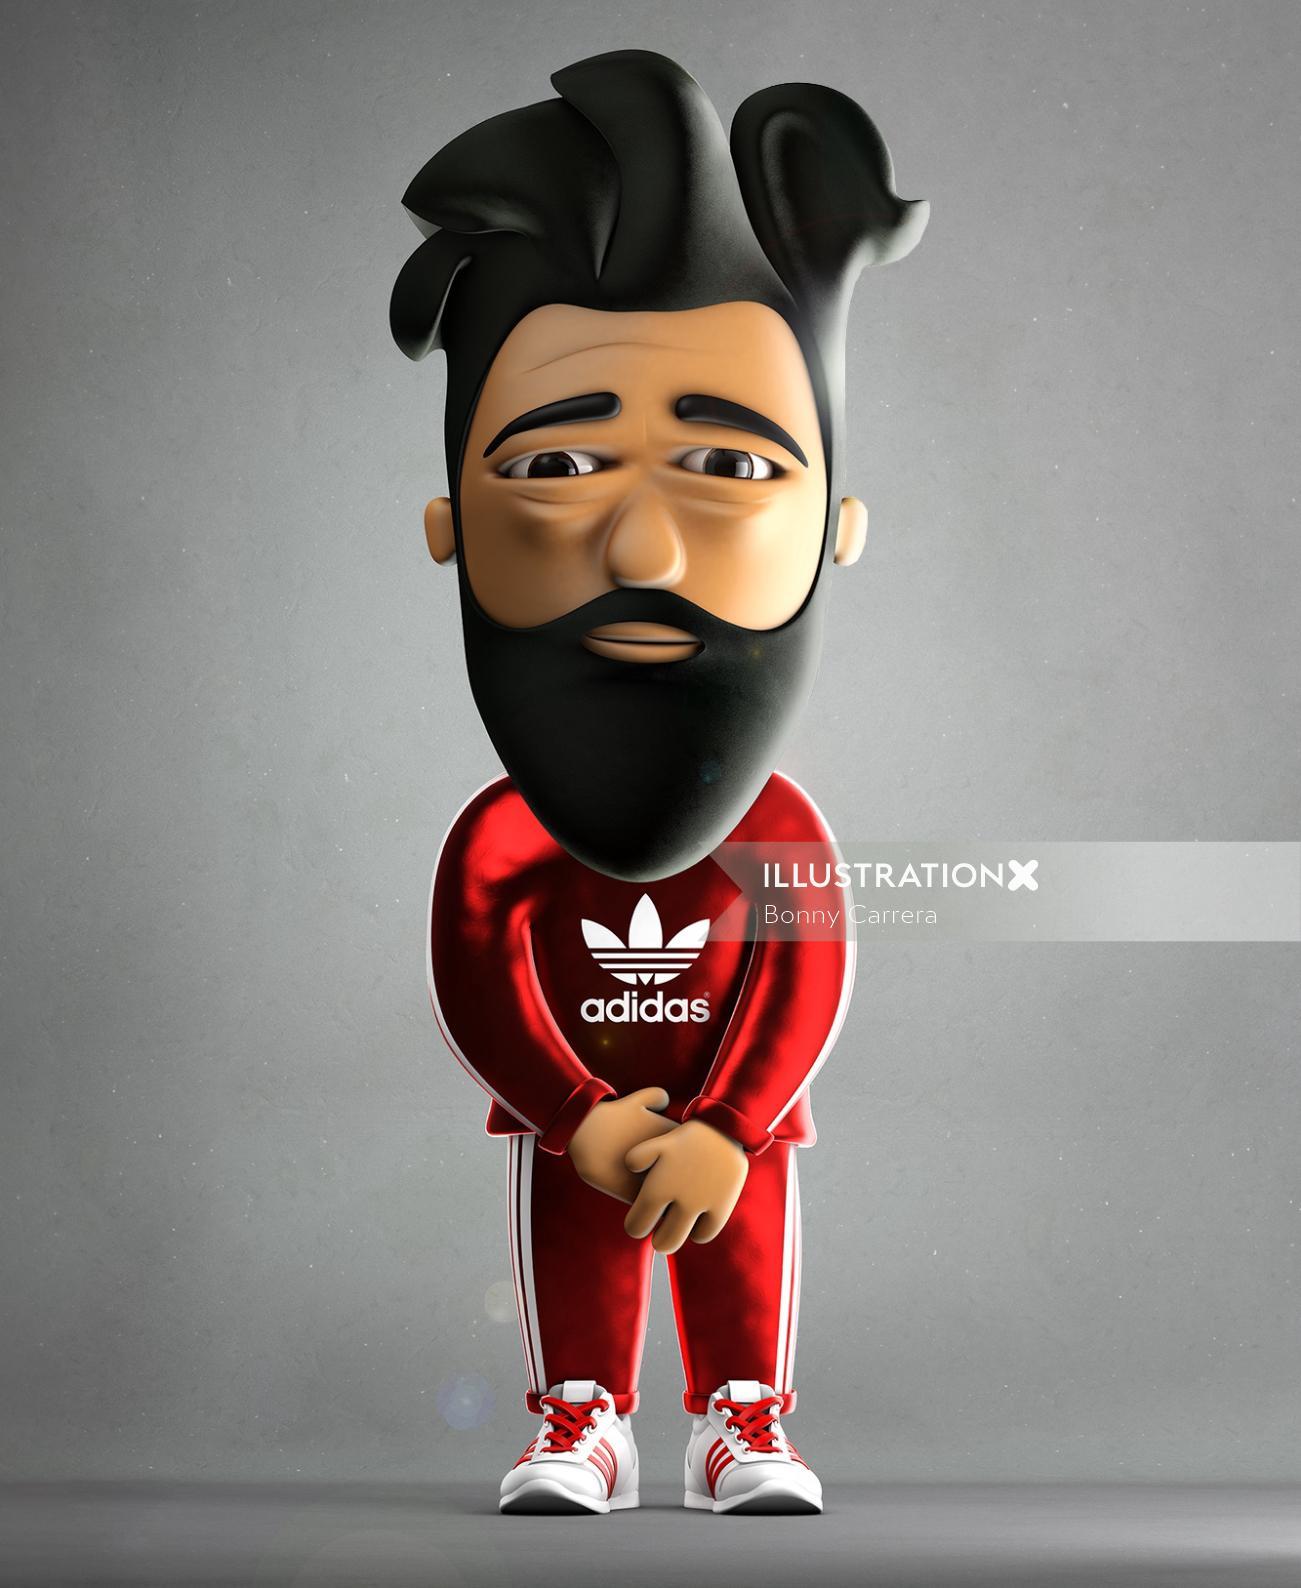 Adidas character design